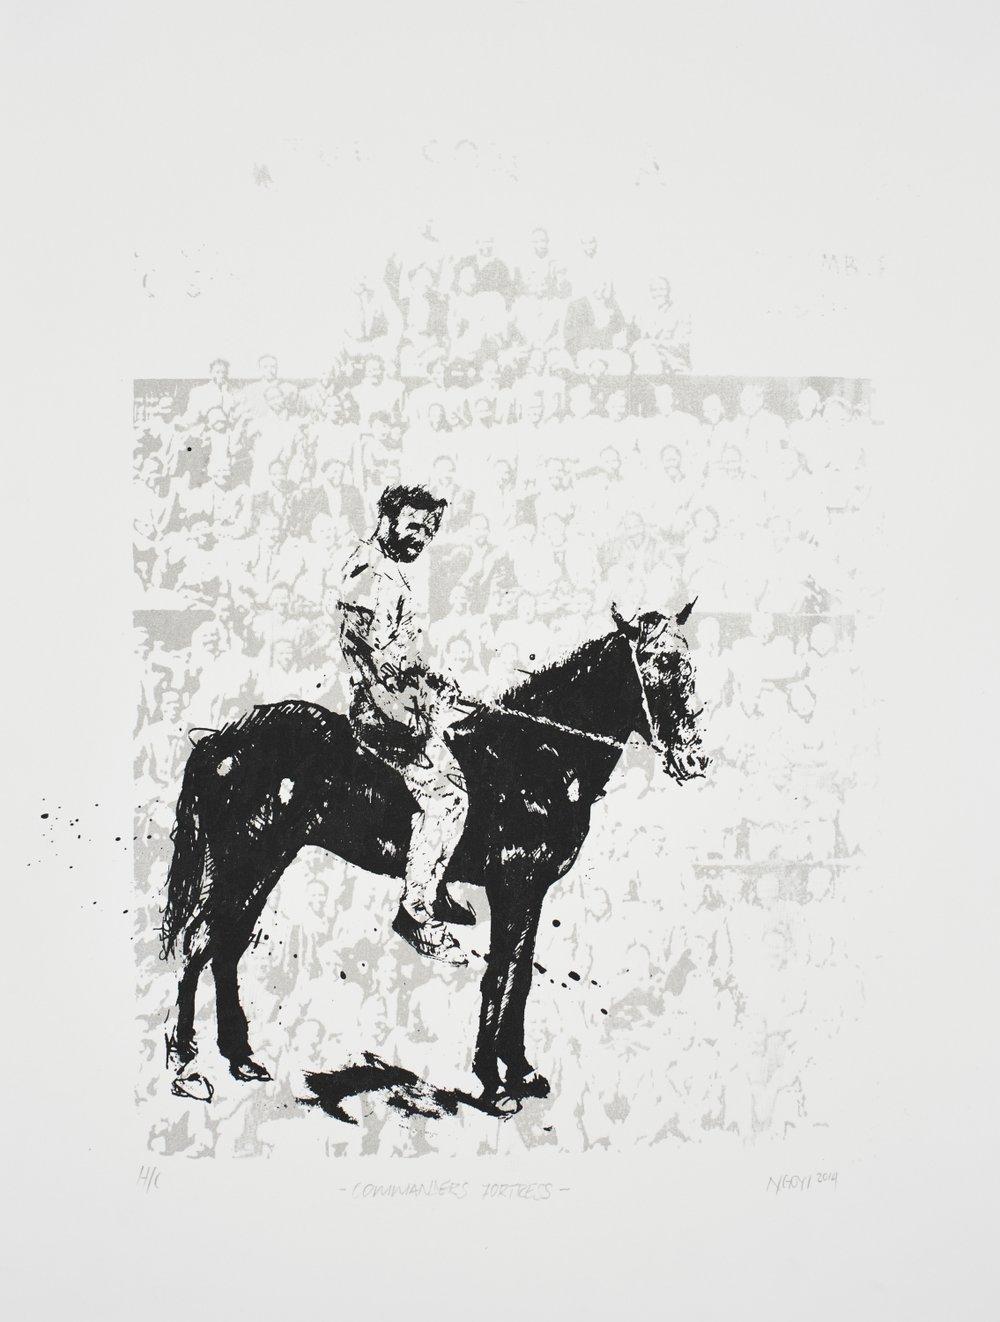 Commander's Fortress   Minenkulu Ngoyi  Silkscreen on paper  Edition of 44   R 3 200.00 excl. vat